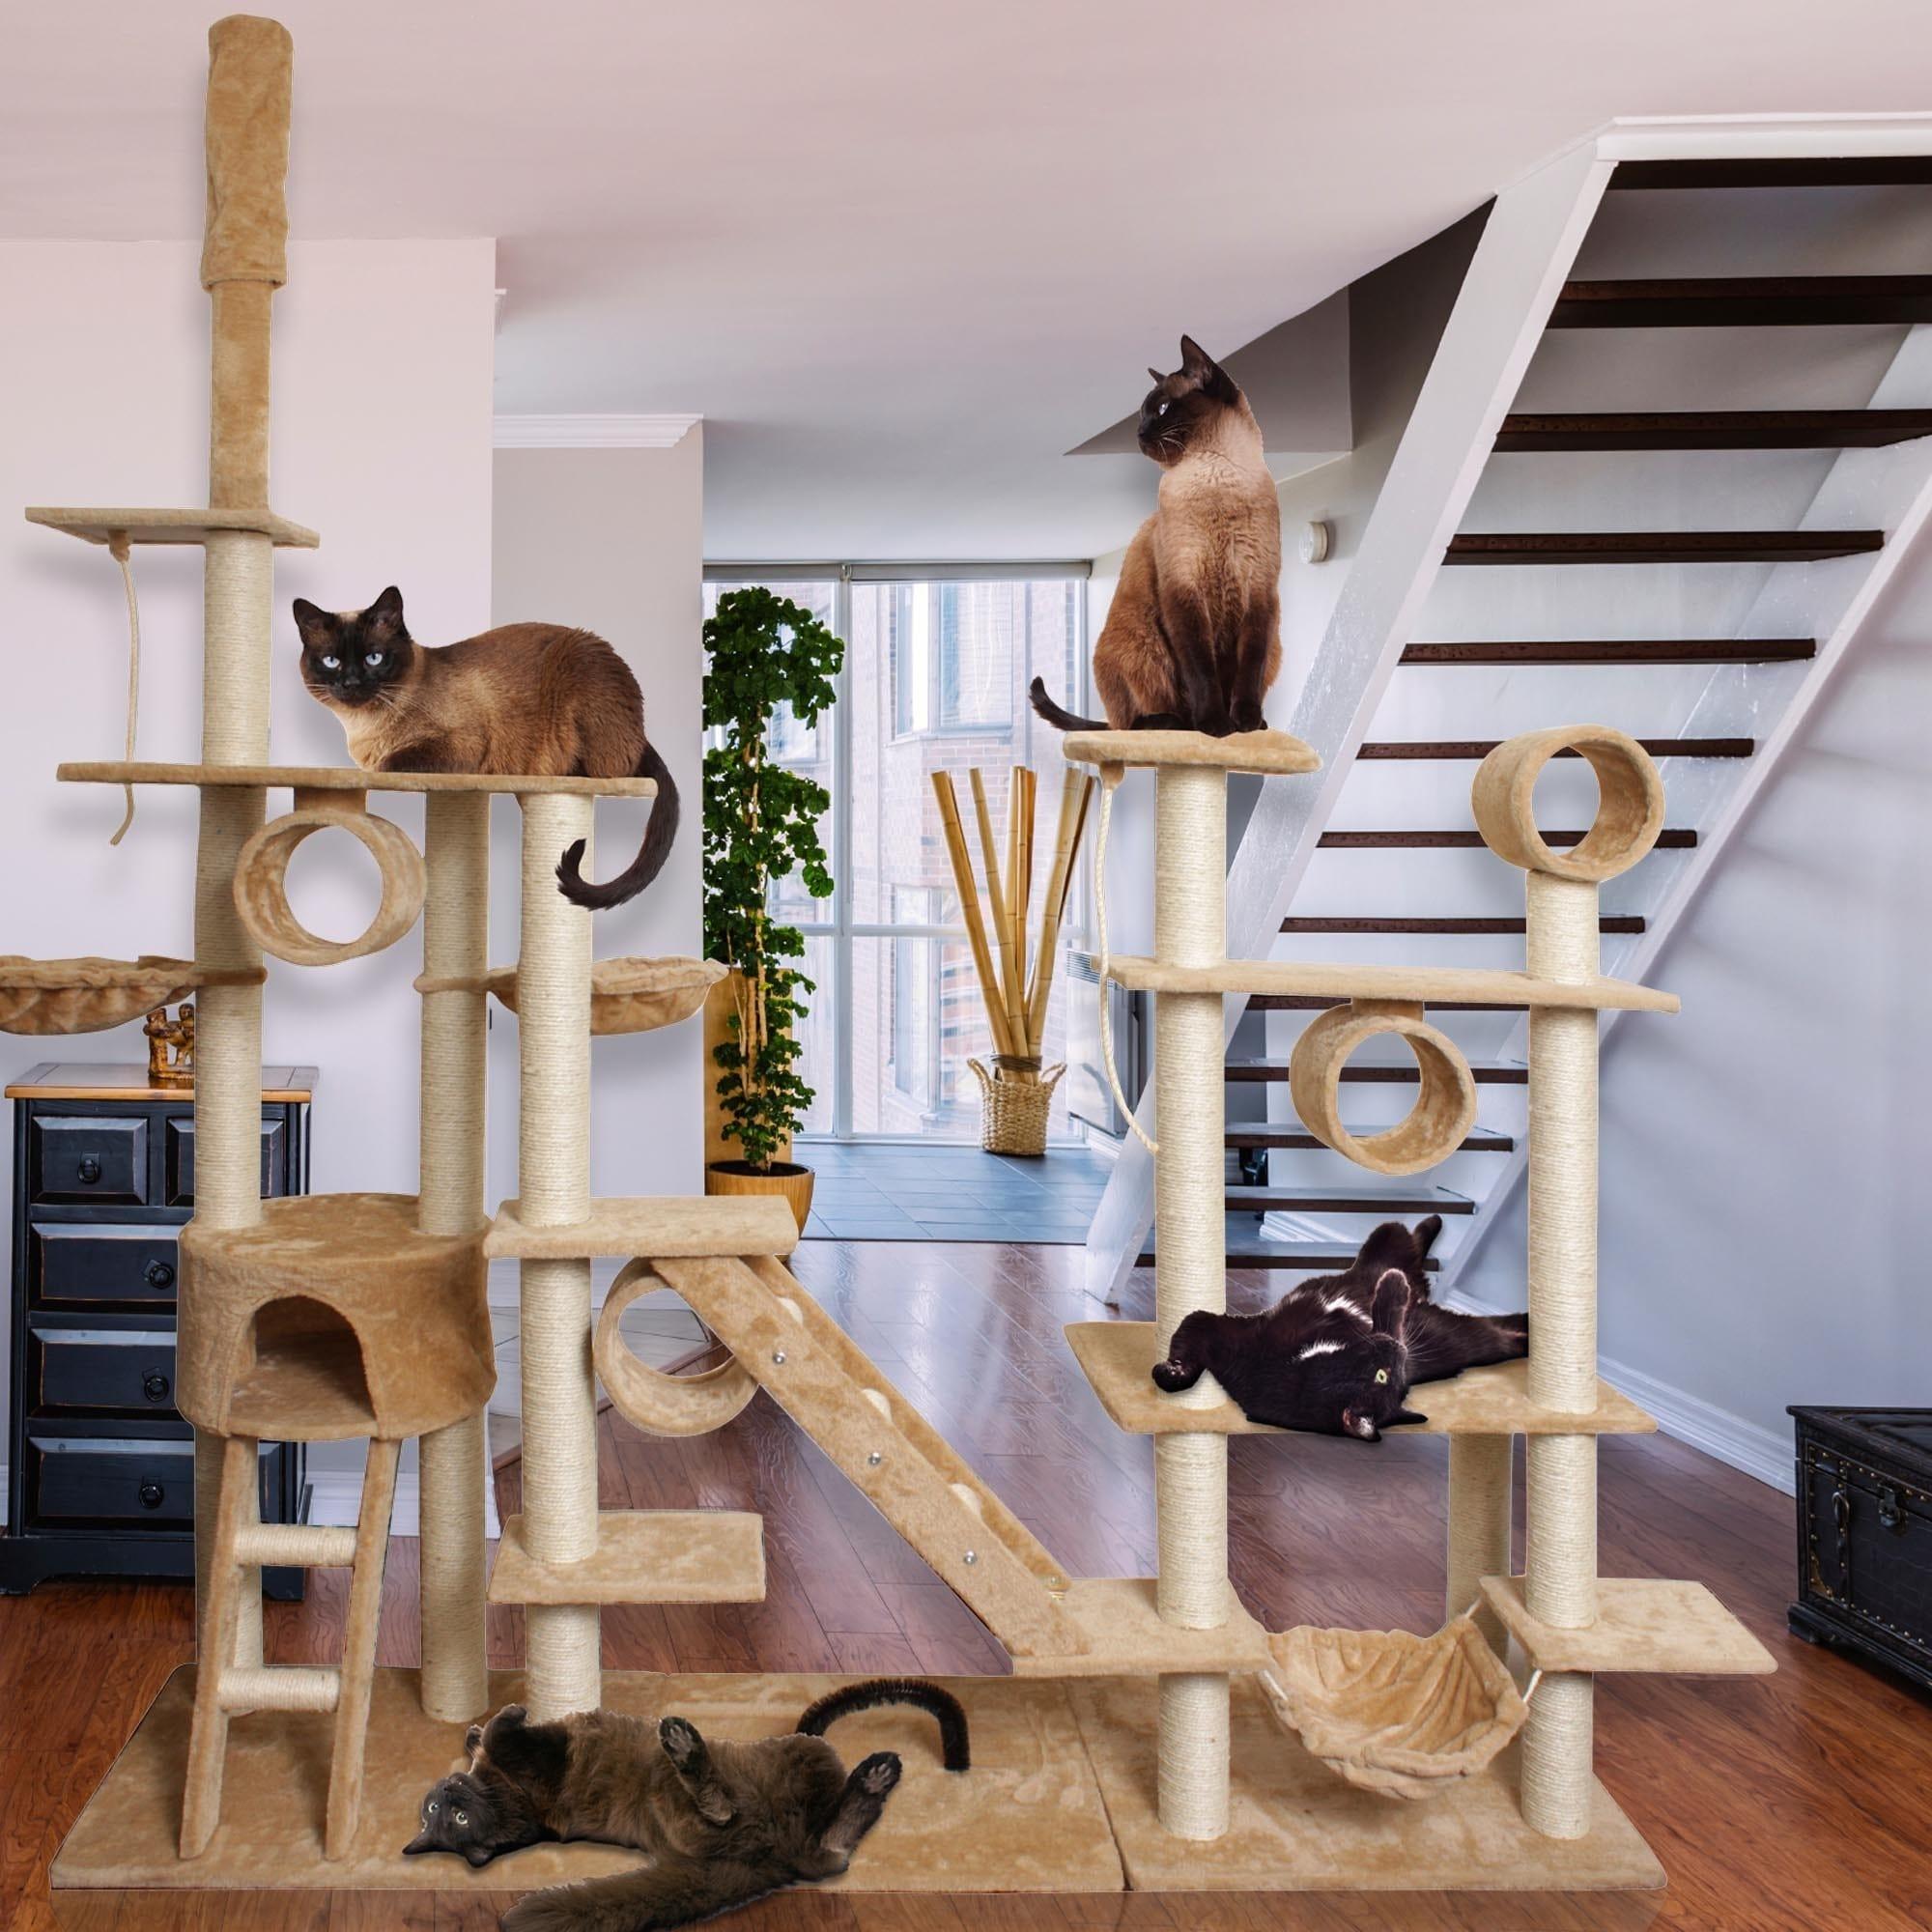 Oxgord Tan/ White 96-inch Cat Tree Tower Condo Scratching...